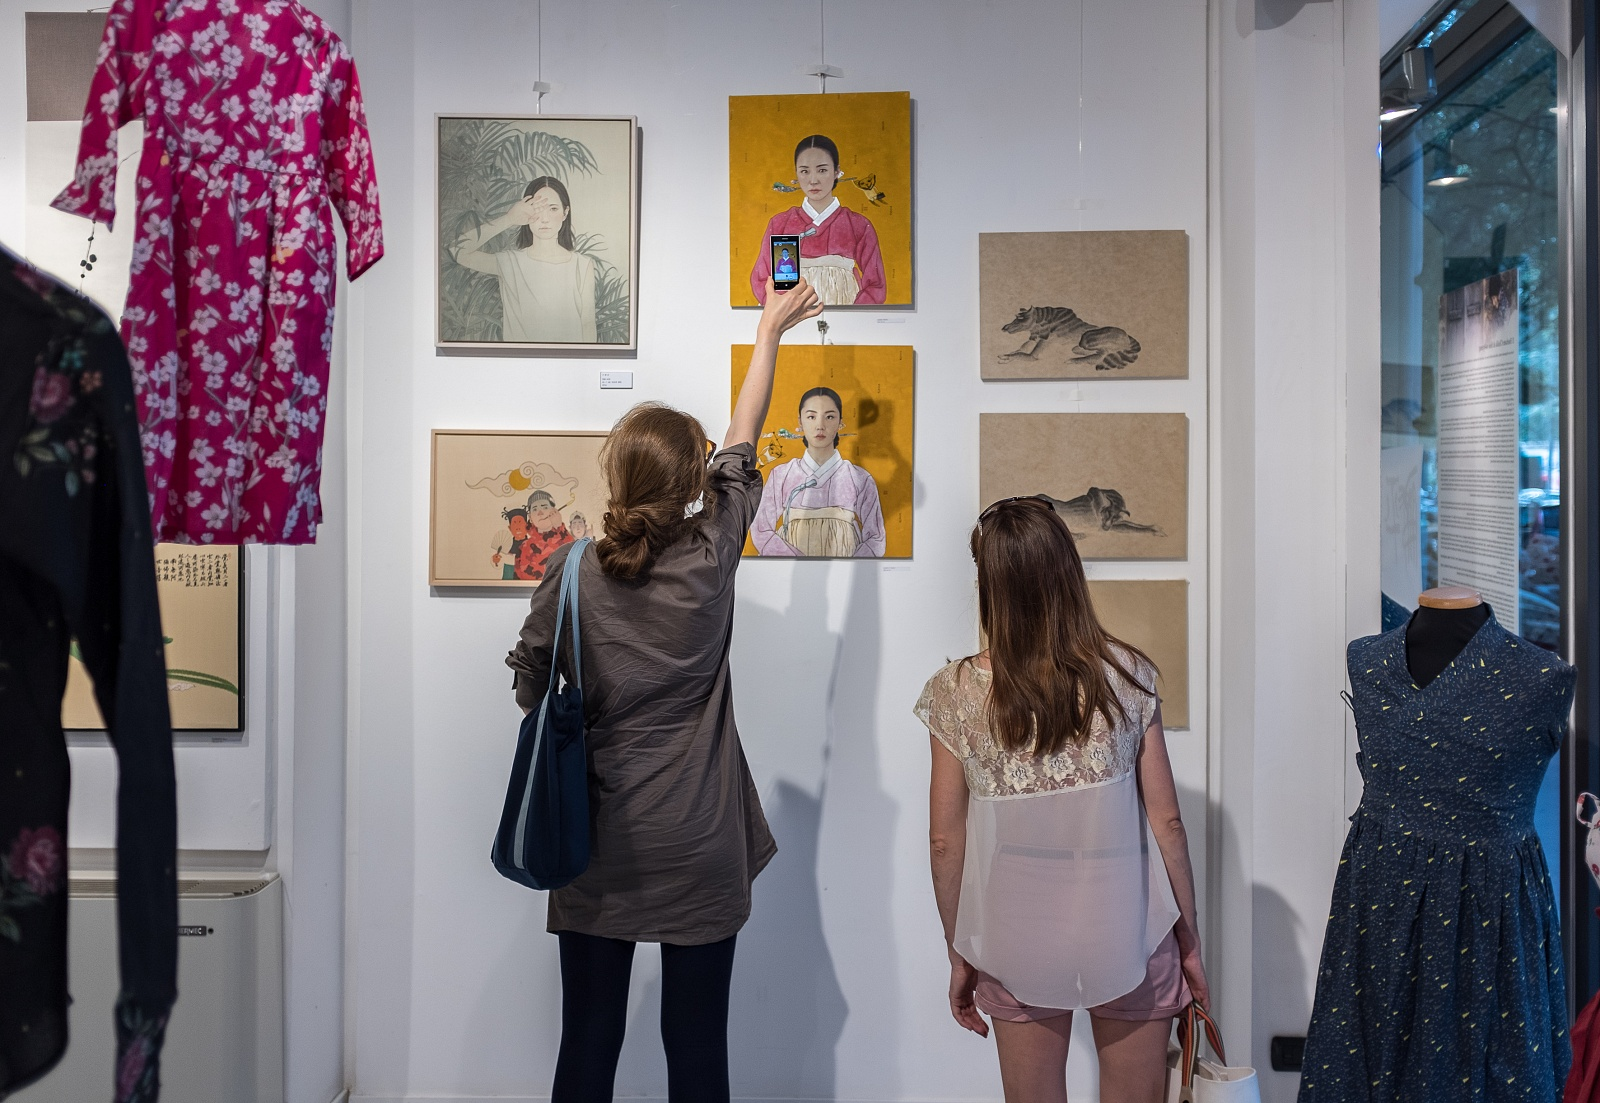 KOREAN WUNDERKAMMER - Mostre collettive di Su Muk e arte Min-hwa (03/07/2018 -21/07/2018 )